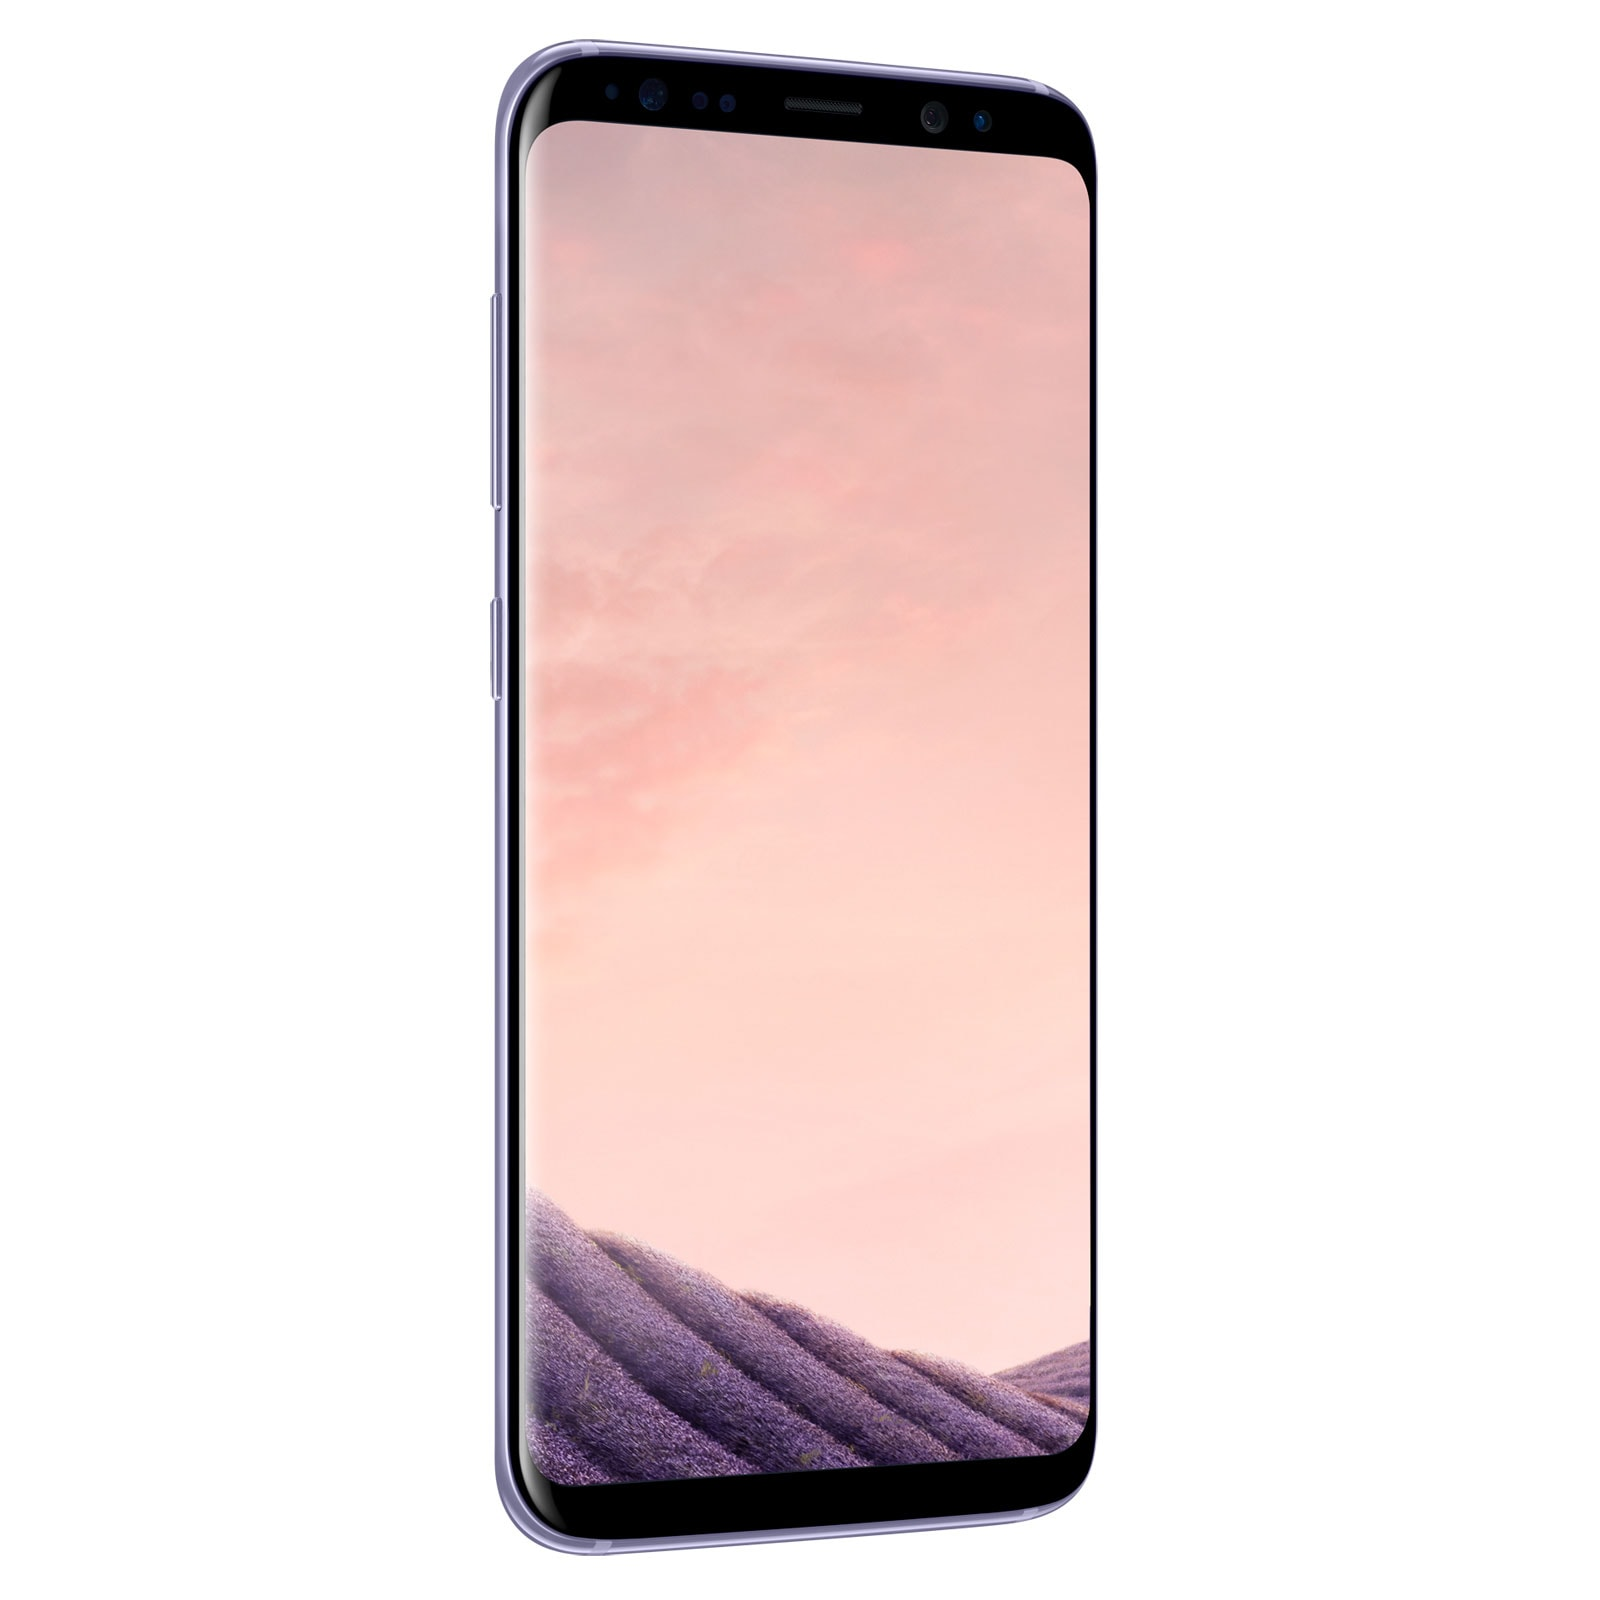 Samsung Galaxy S8 64Go G950 Orchid Gray - Téléphonie Samsung - 4